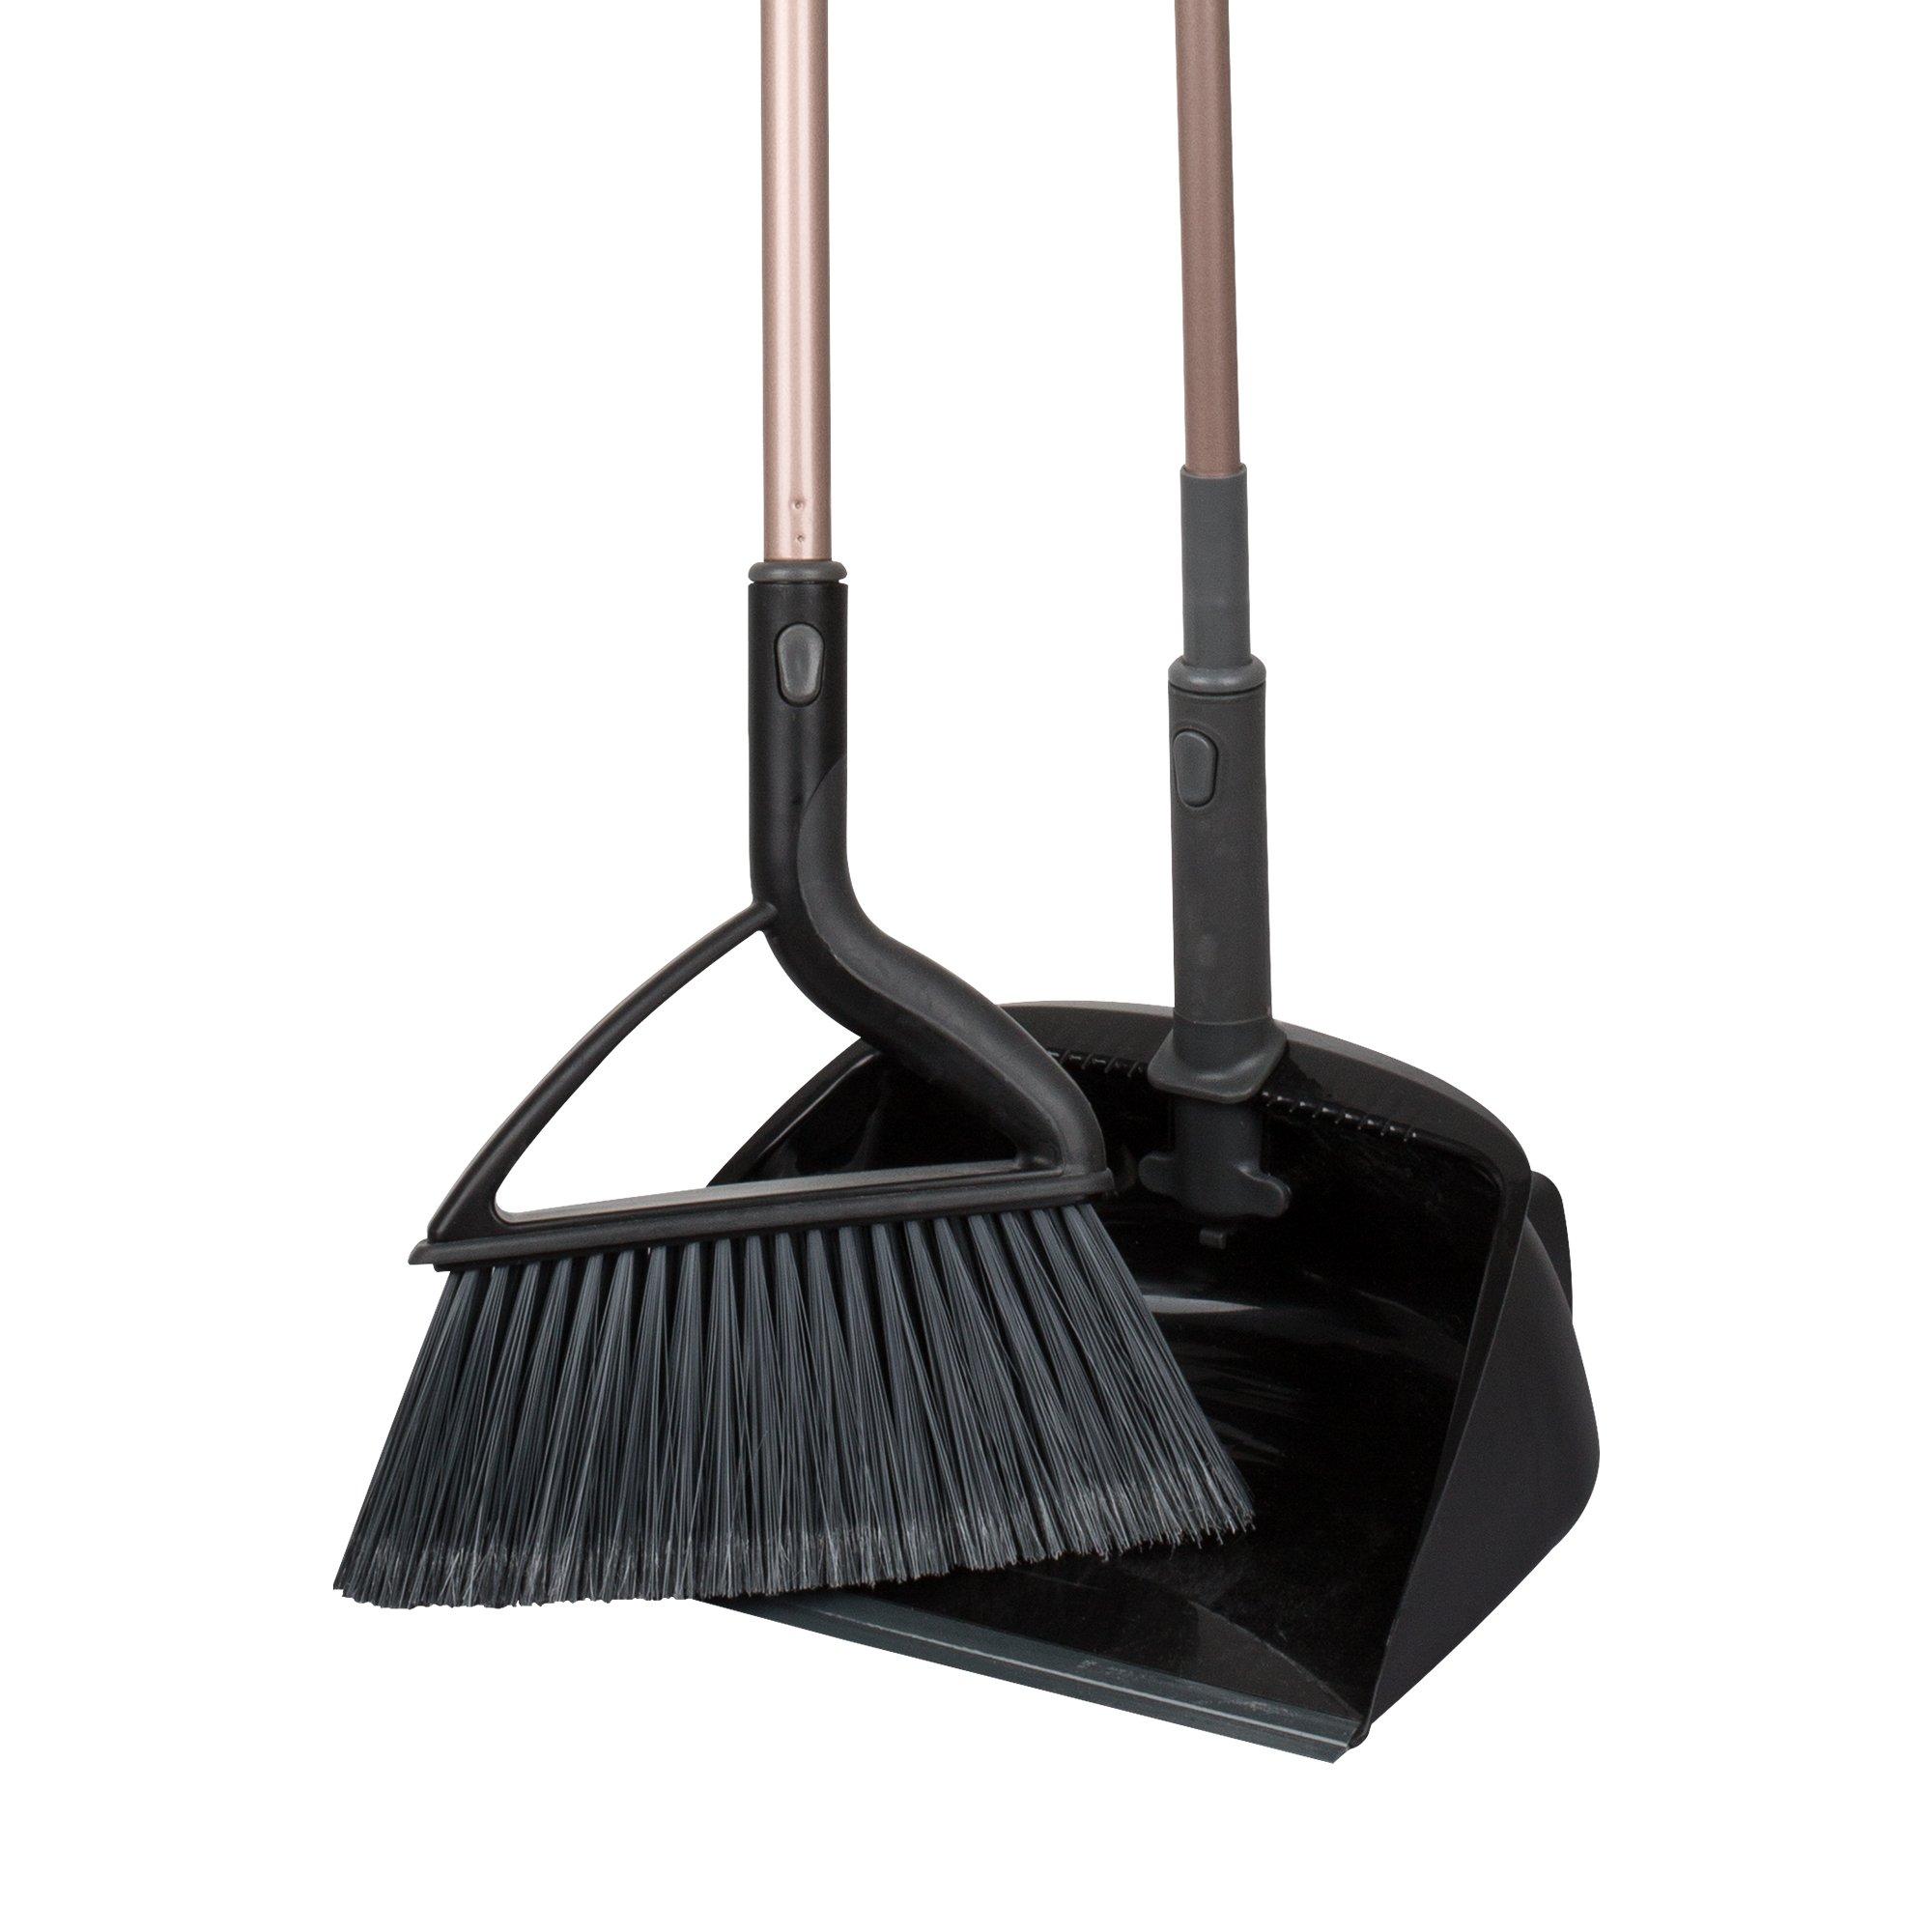 Casabella Quick N Easy Upright Sweep Set, Rose Gold by Casabella (Image #1)